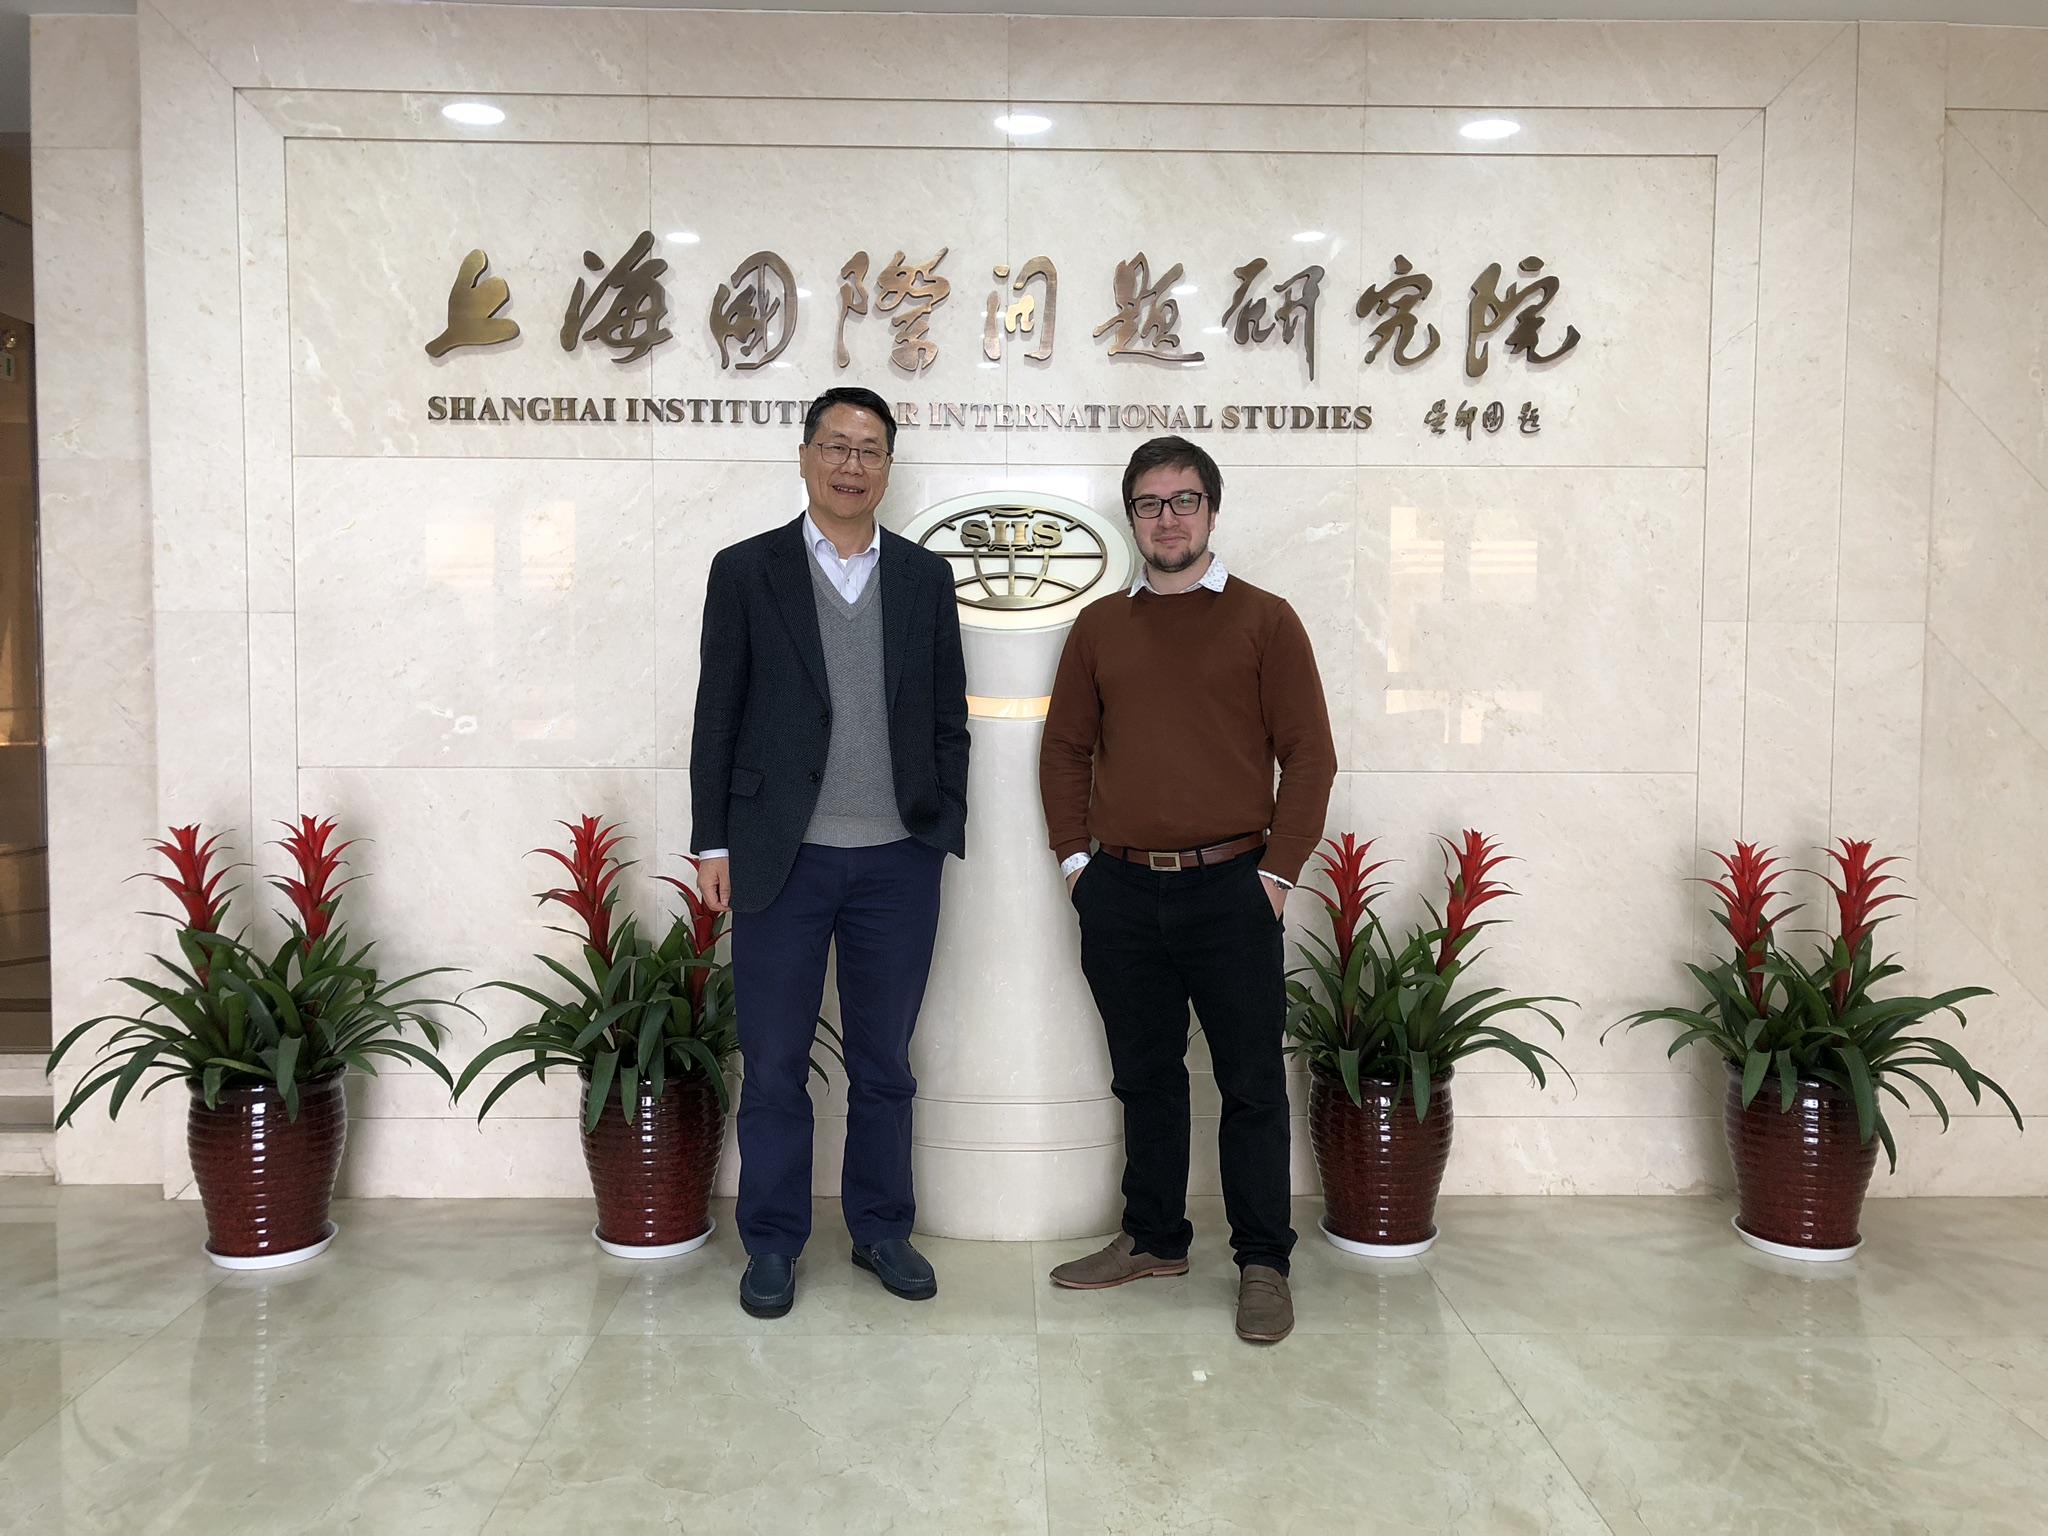 Meeting with Shanghai Institute of International Studies Vice President Yang Jian